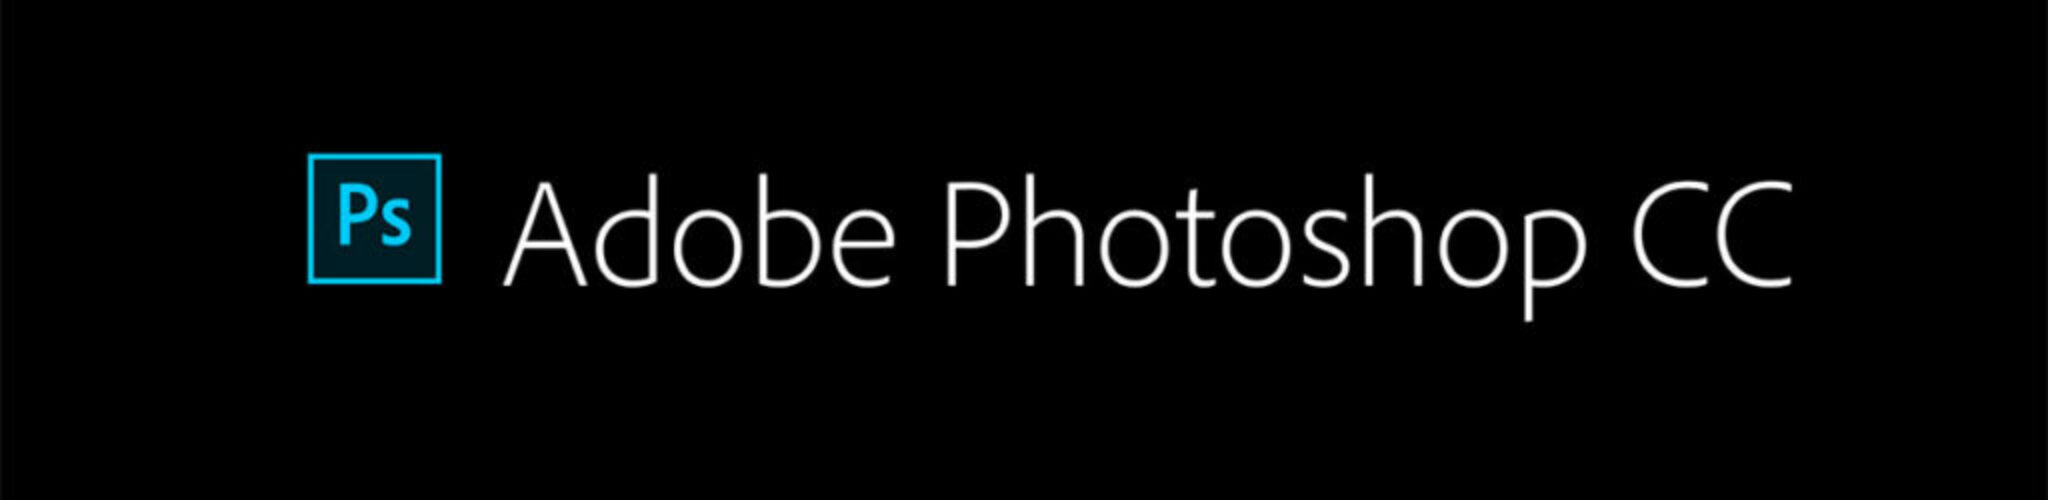 adobe-photoshop-cc-logo